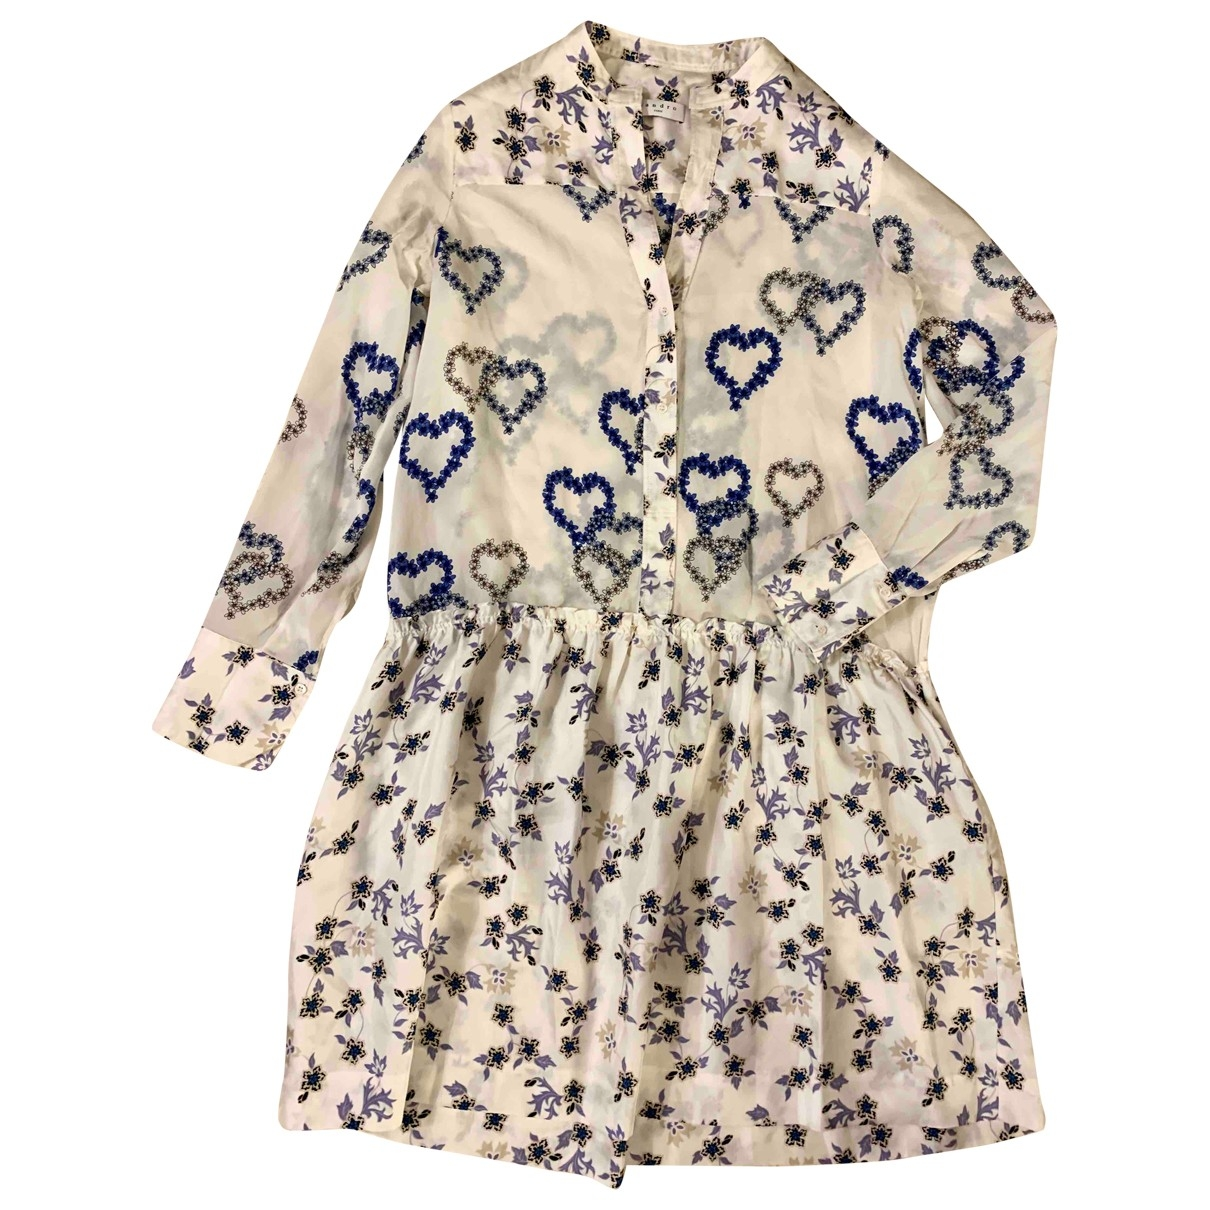 Sandro Spring Summer 2019 Kleid in  Blau Seide